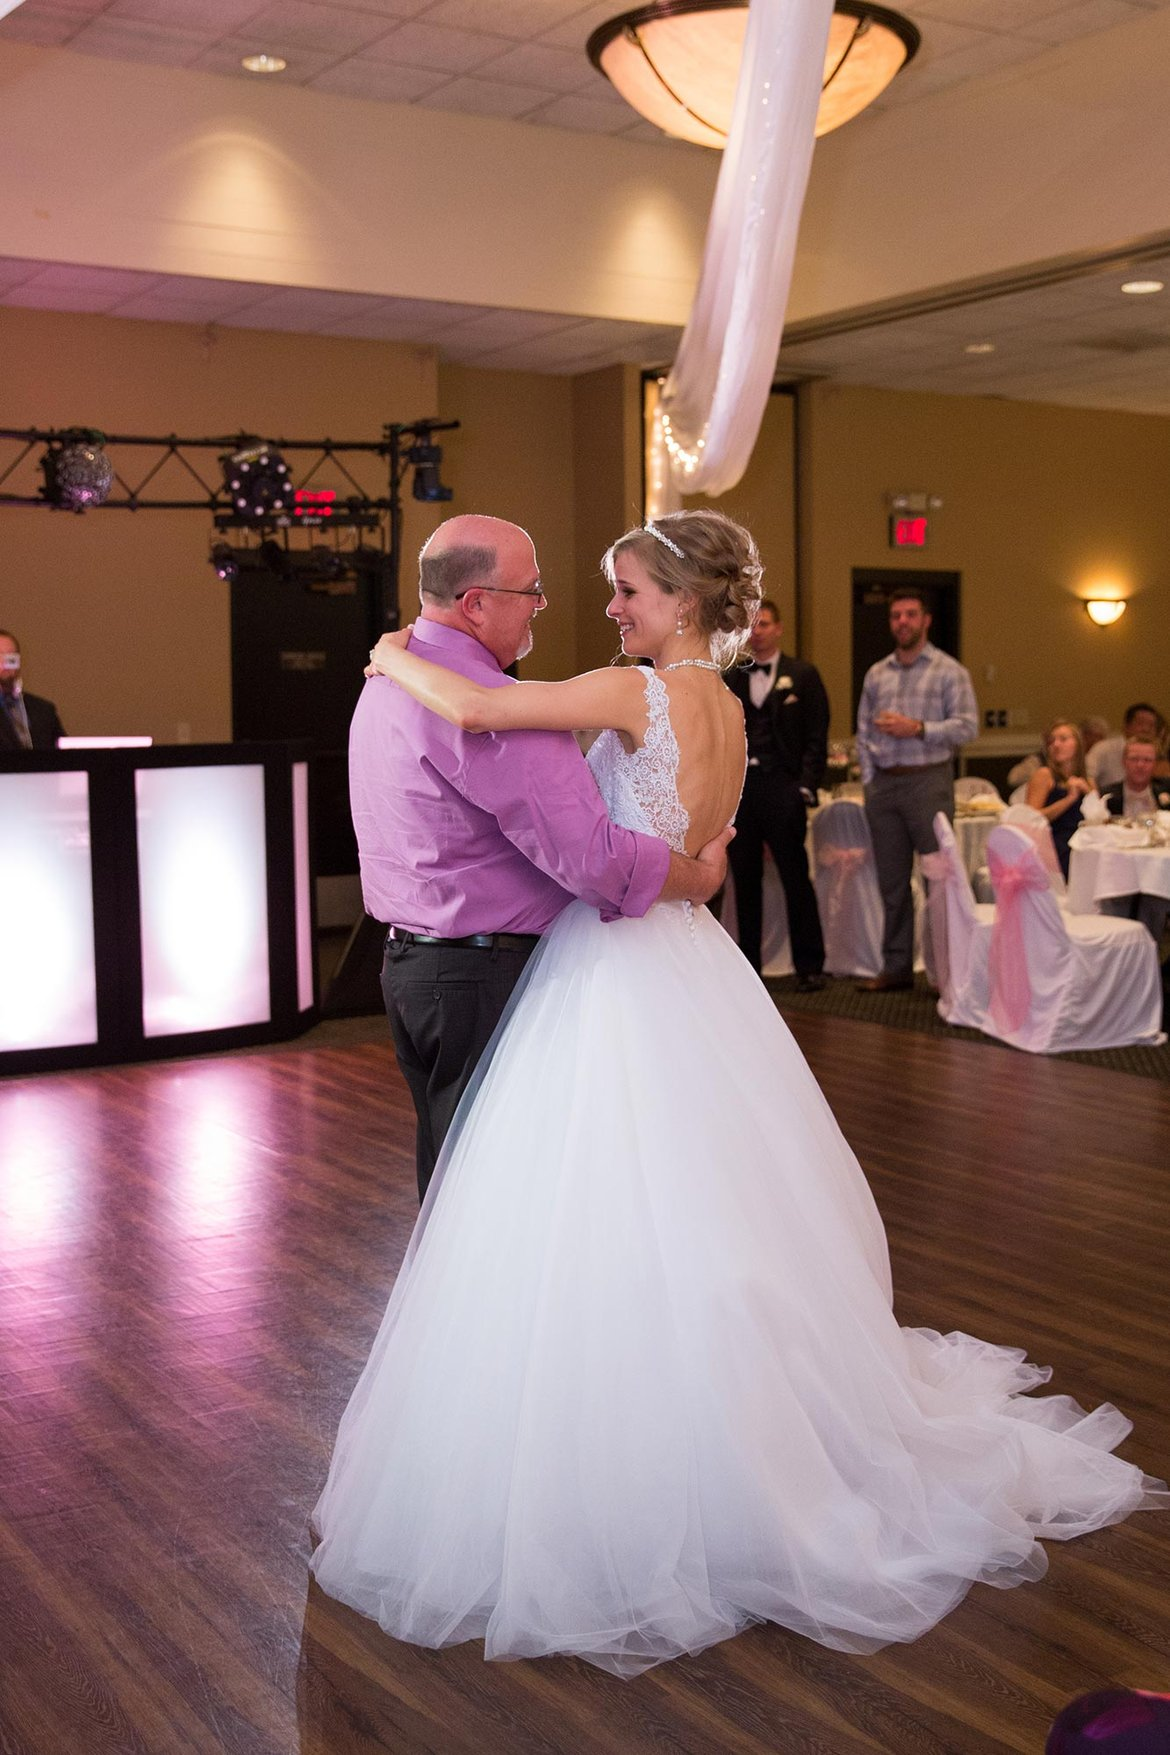 Bride Shares Wedding Dance With Organ Donor